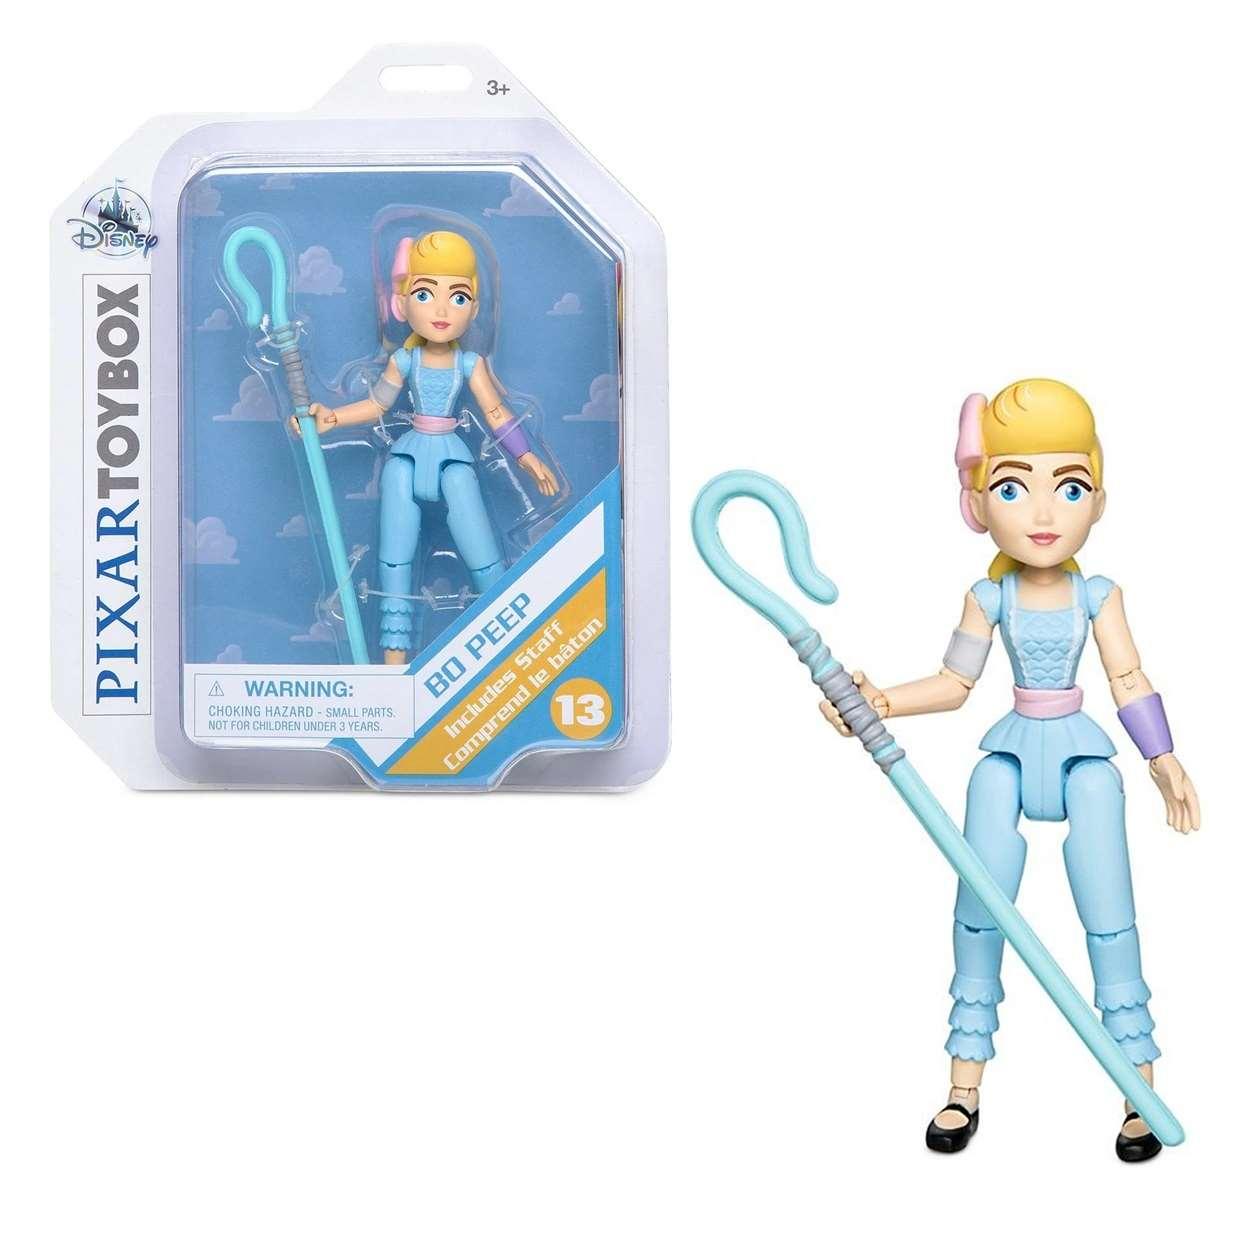 Bo Peep Includes Staff #13 Disney Pixar Toy Story Toybox